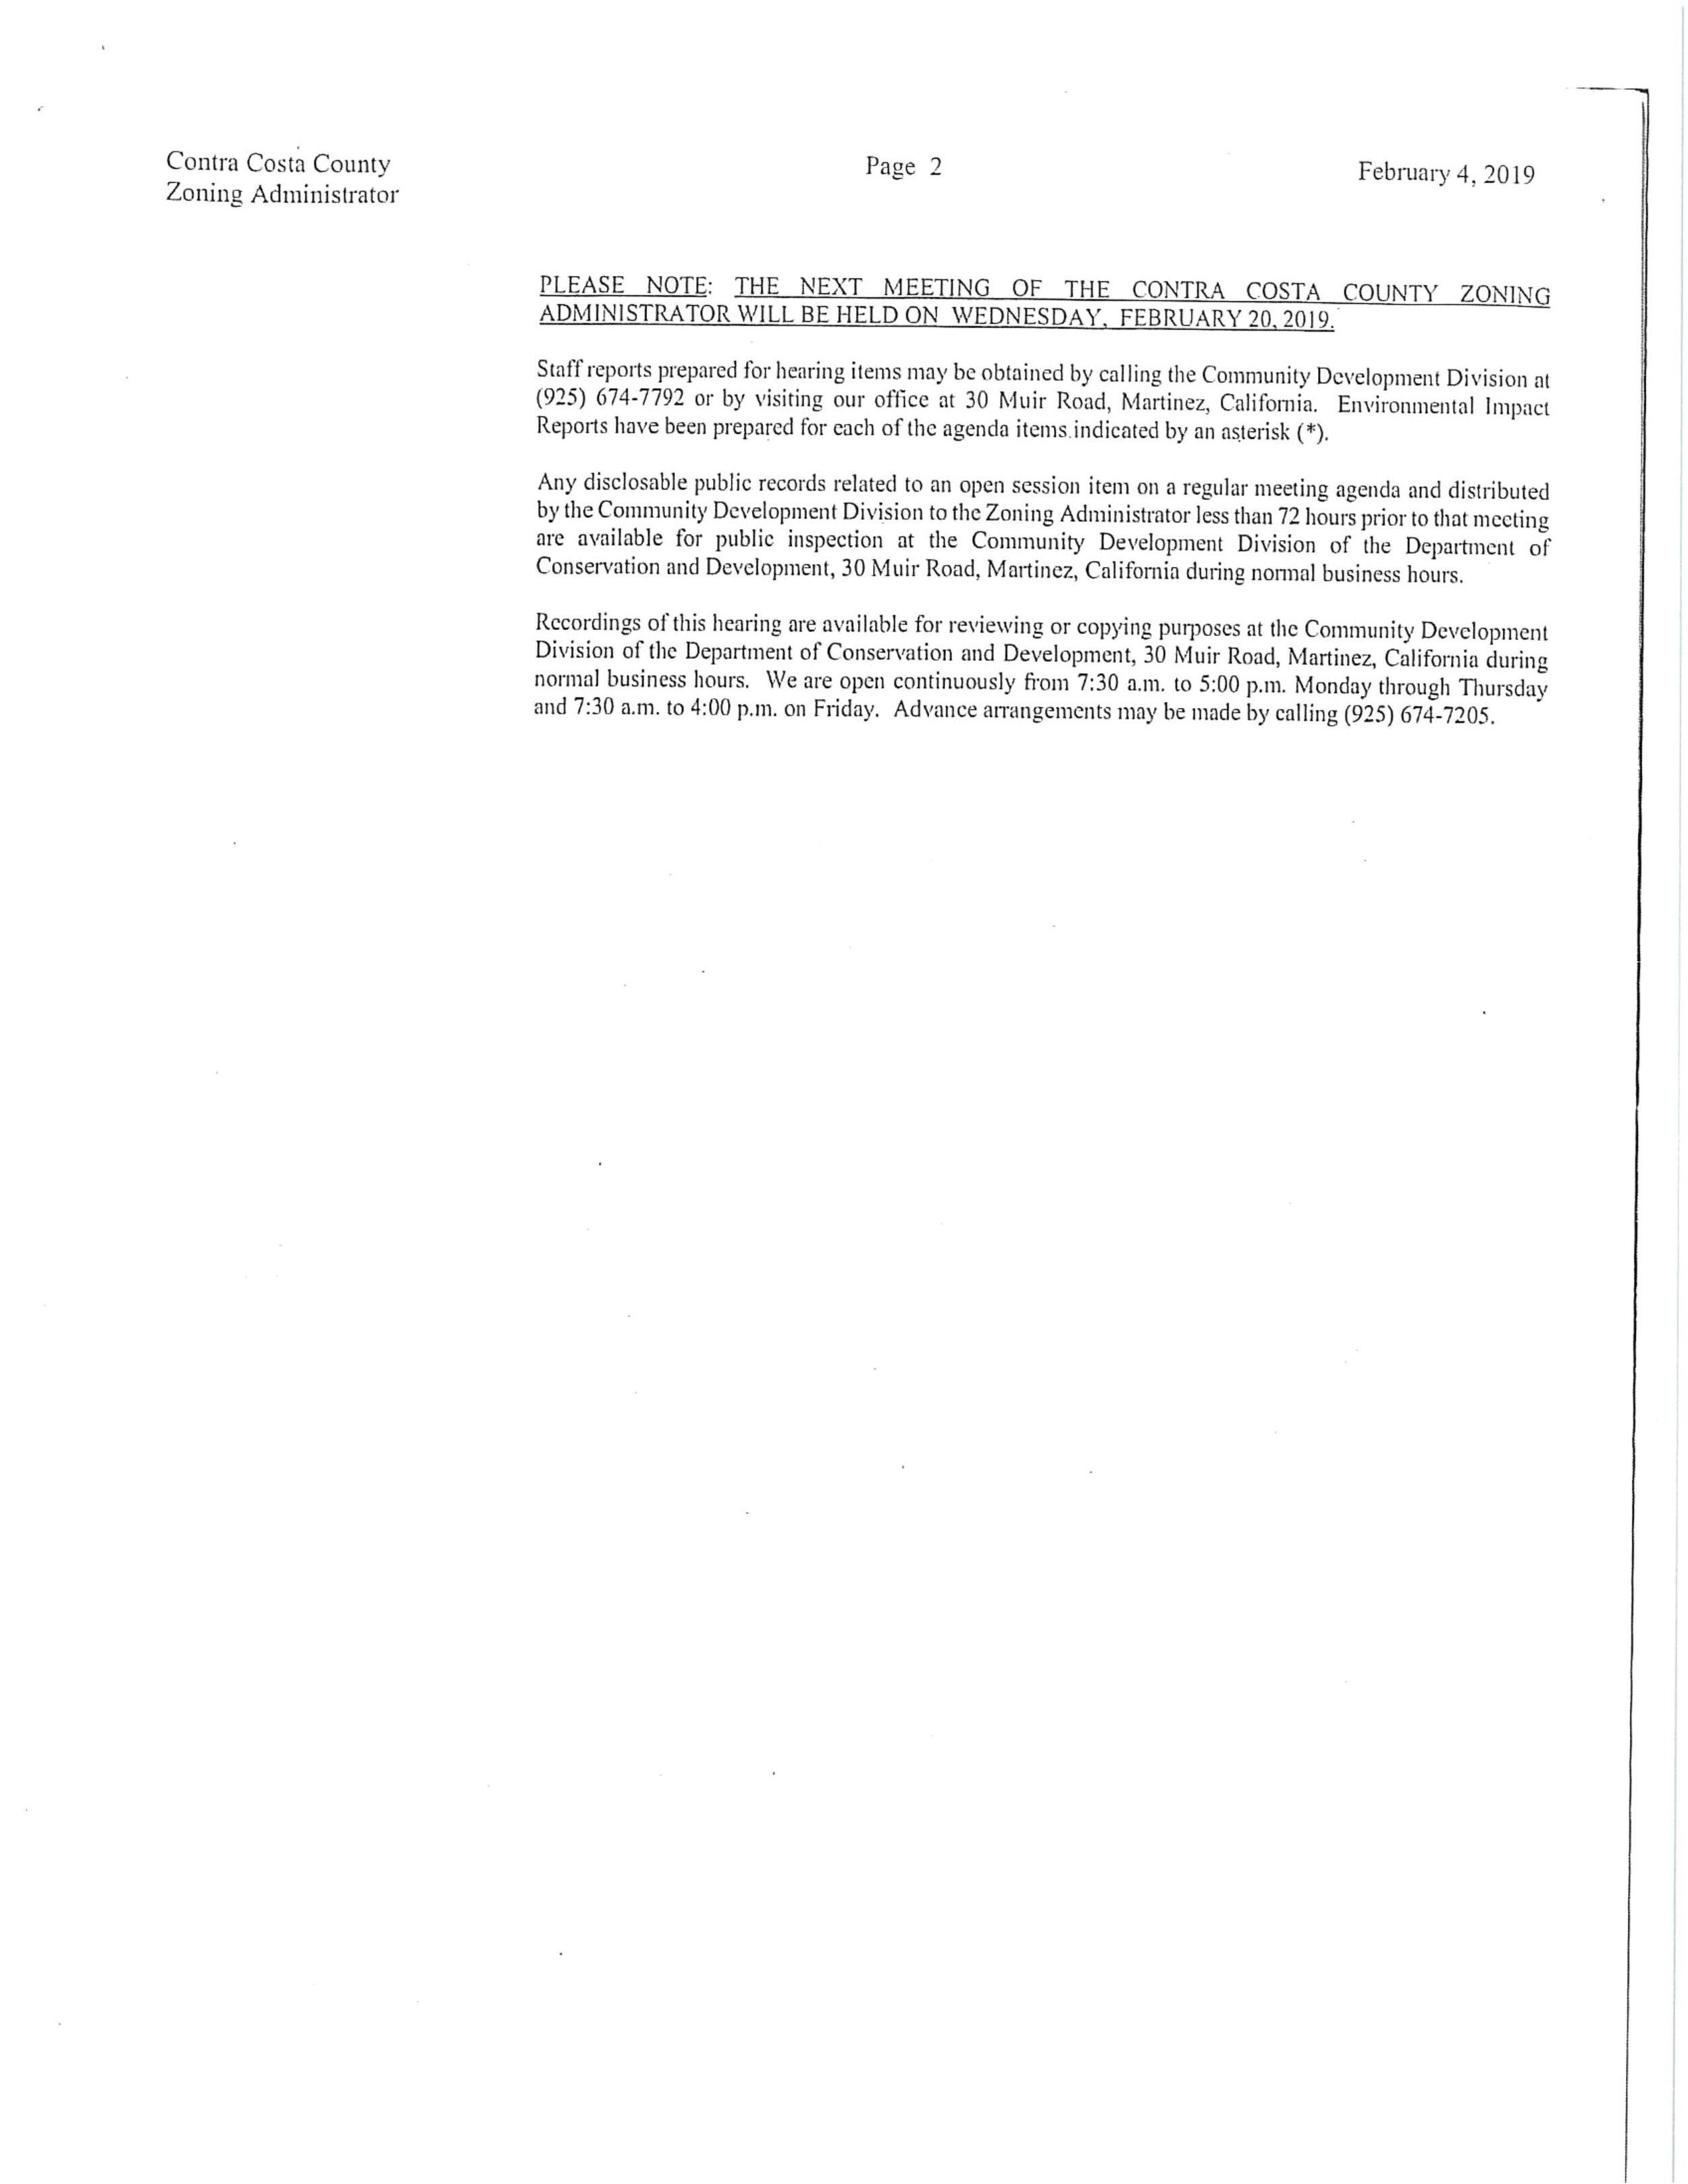 ESMAC Agenda 2.13.2019b_43.jpg